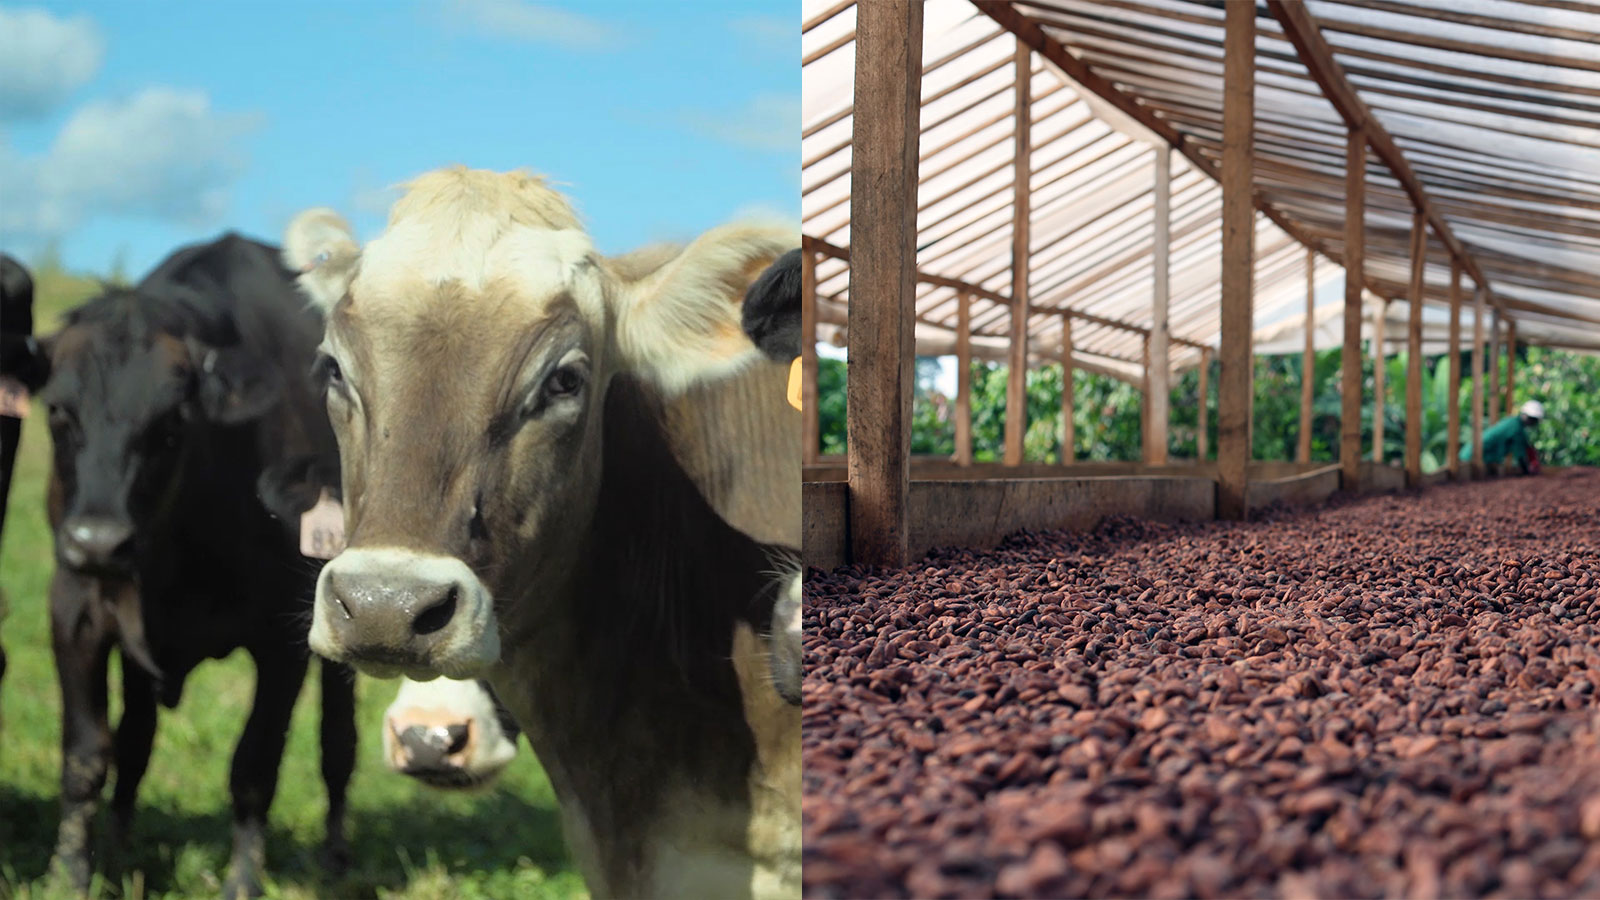 Kindred Creamery Farm and Cacao Trace Cocao Bean Fermentation